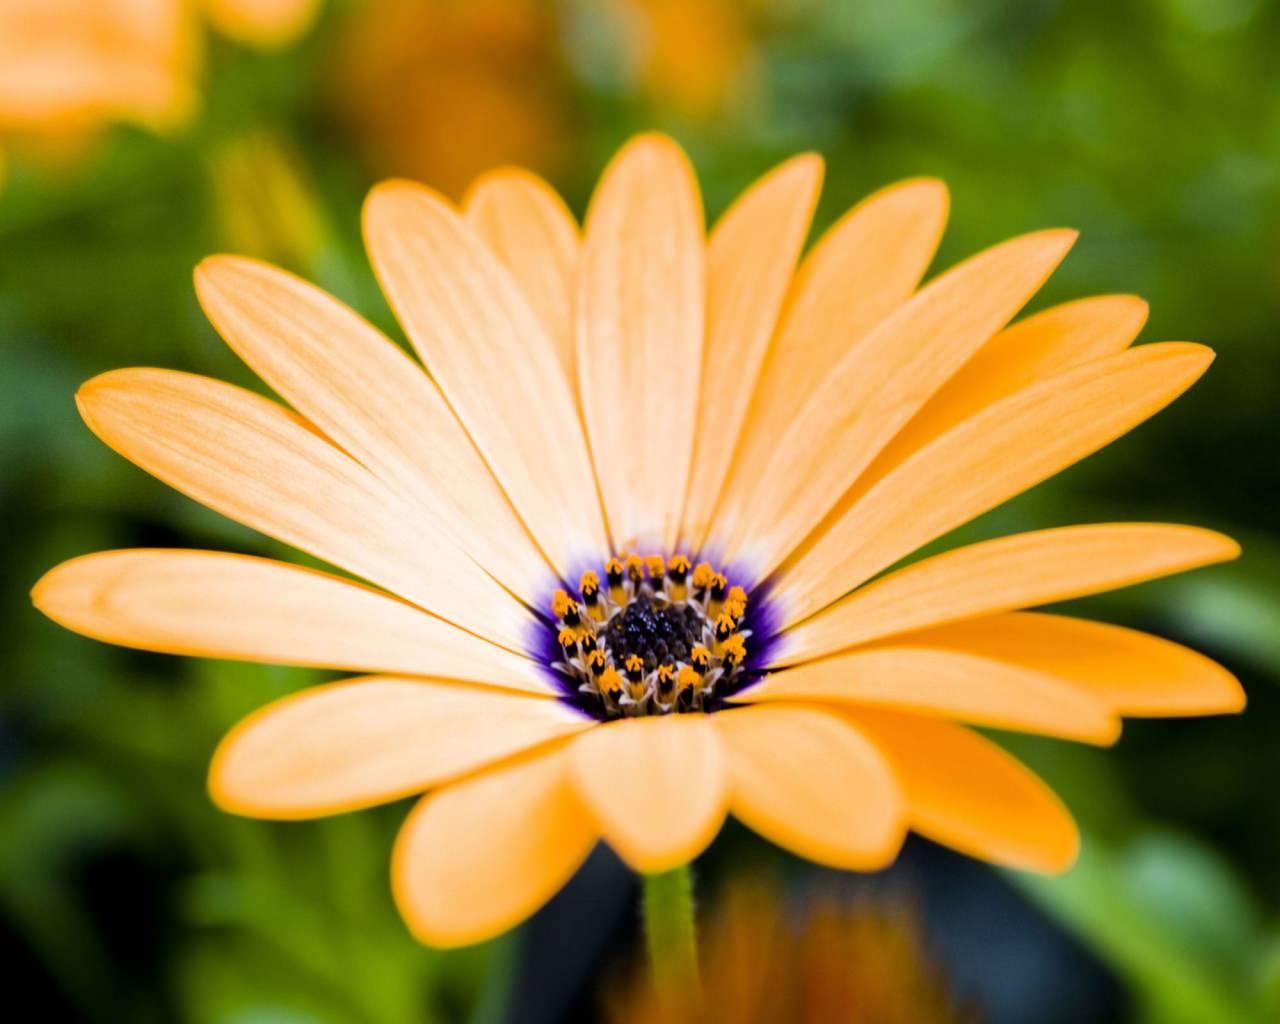 Free 20 Hd Desktop Flower Wallpapers In Psd Vector Eps